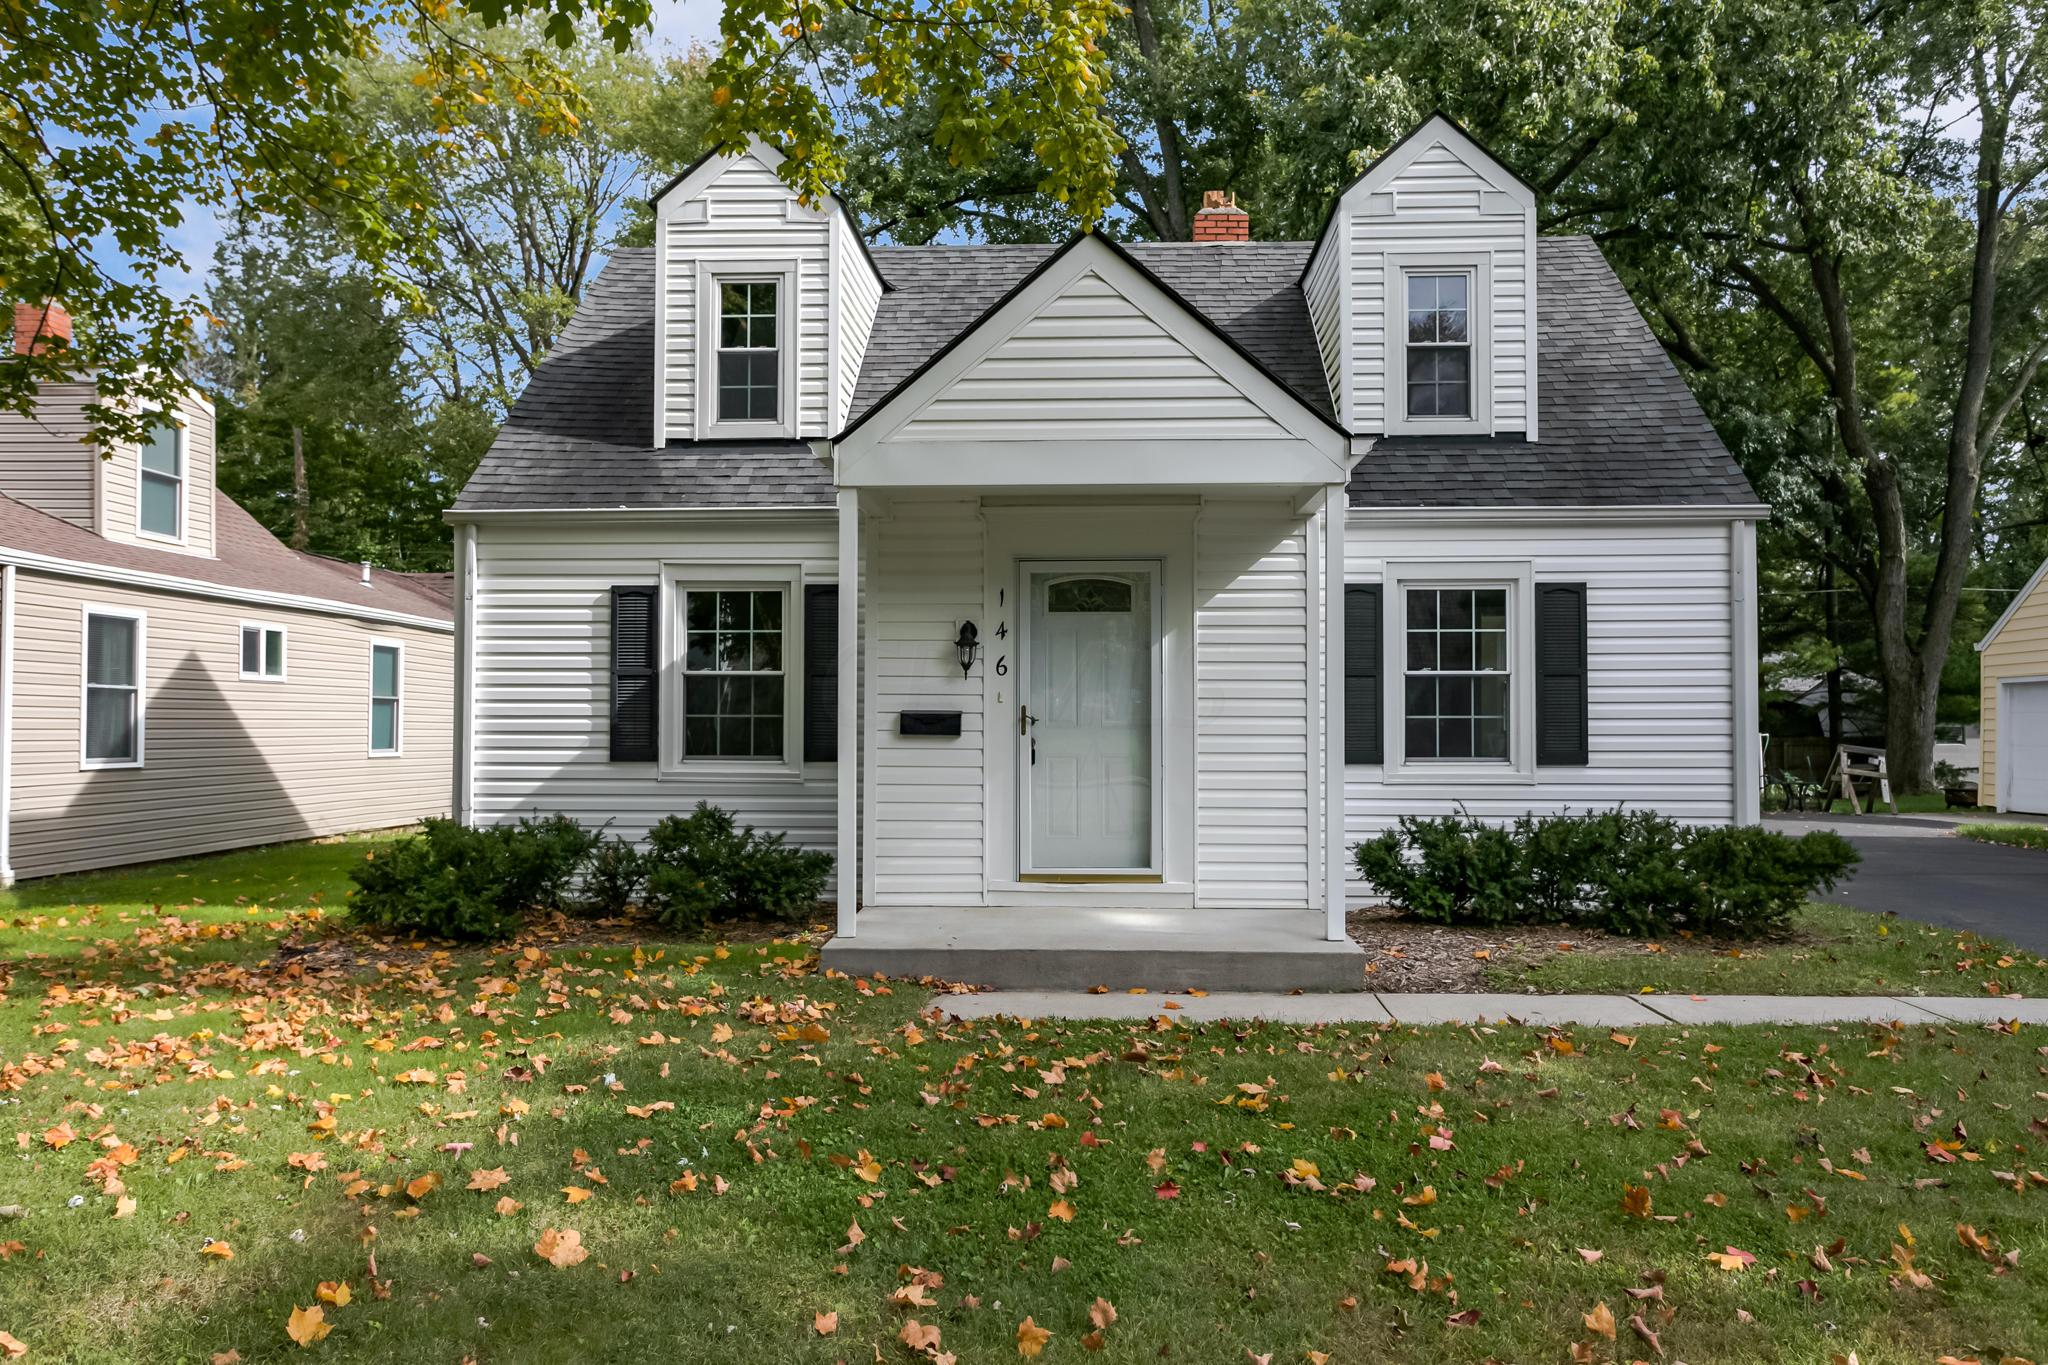 Phenomenal 146 Shull Avenue Gahanna Oh 43230 Ross Realtors Home Interior And Landscaping Dextoversignezvosmurscom